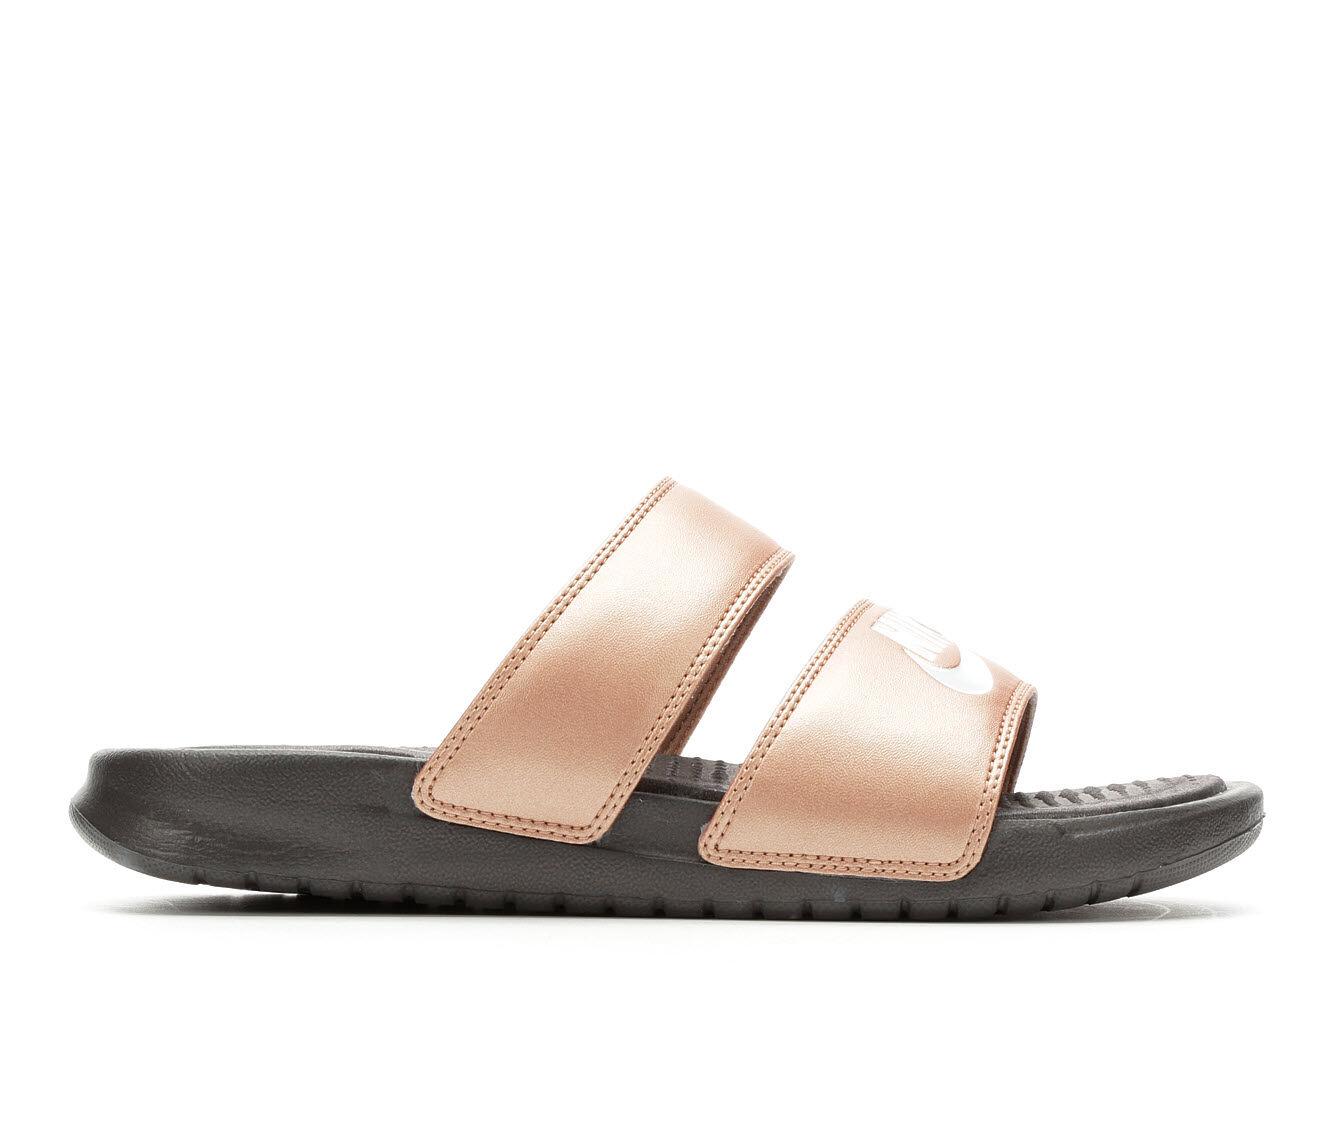 choose comfortable new Women's Nike Benassi Duo Slide Sandals MTLC Bronze/Pla